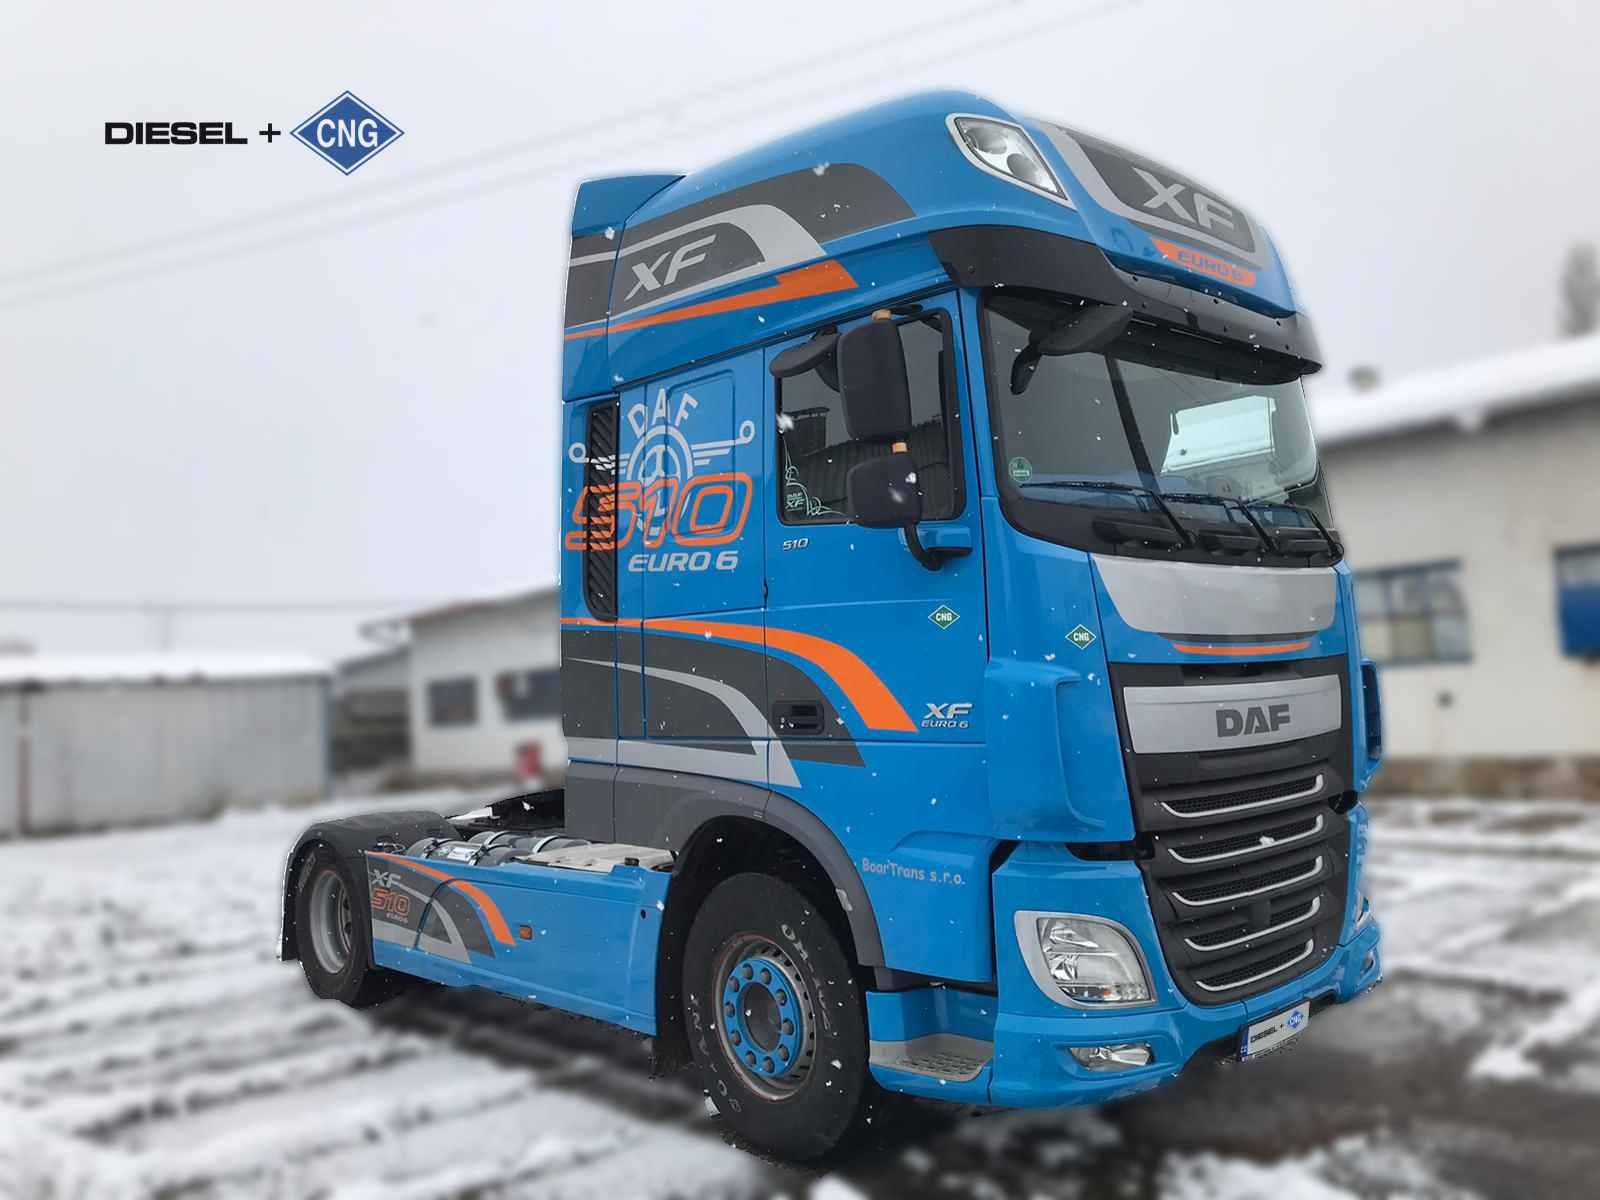 DAF XF 106 Diesel CNG s duálním systémem Fuel Fusion